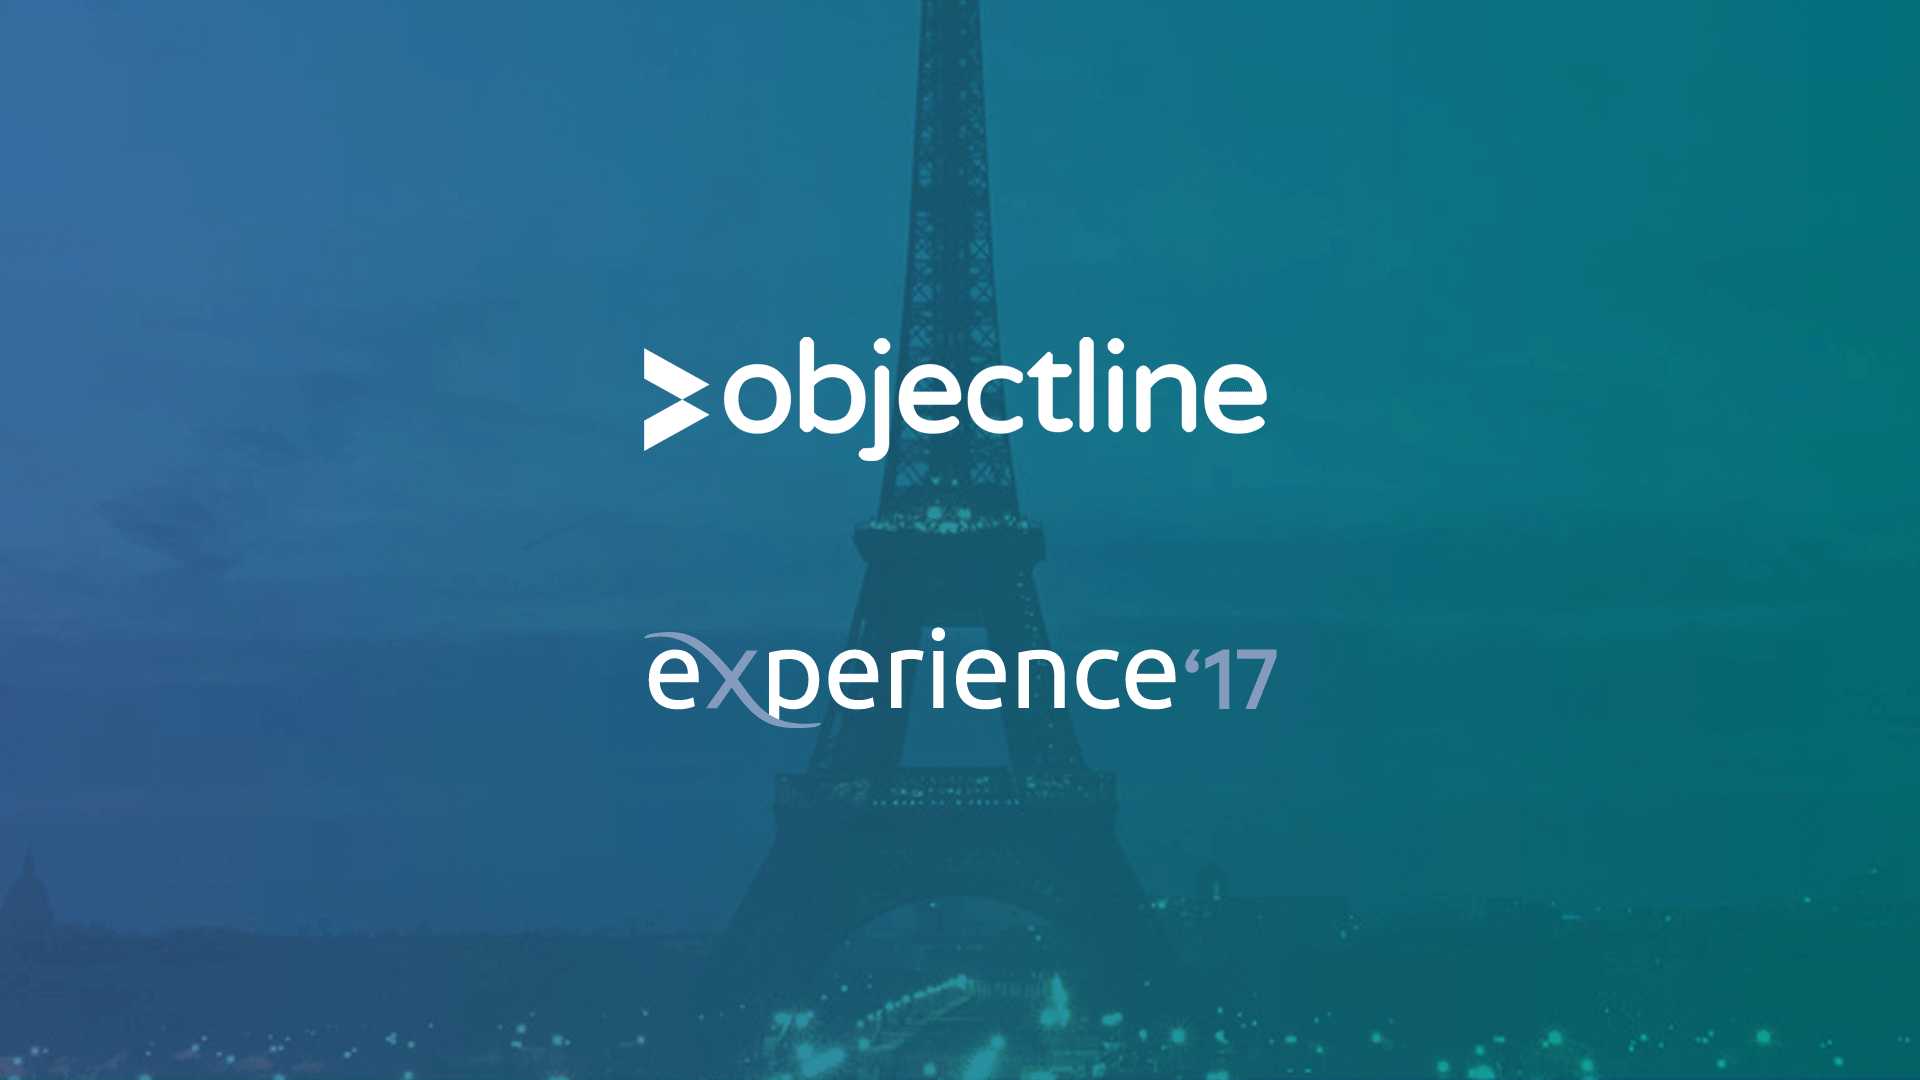 Experience '17 Paris-sponsors-Objectline